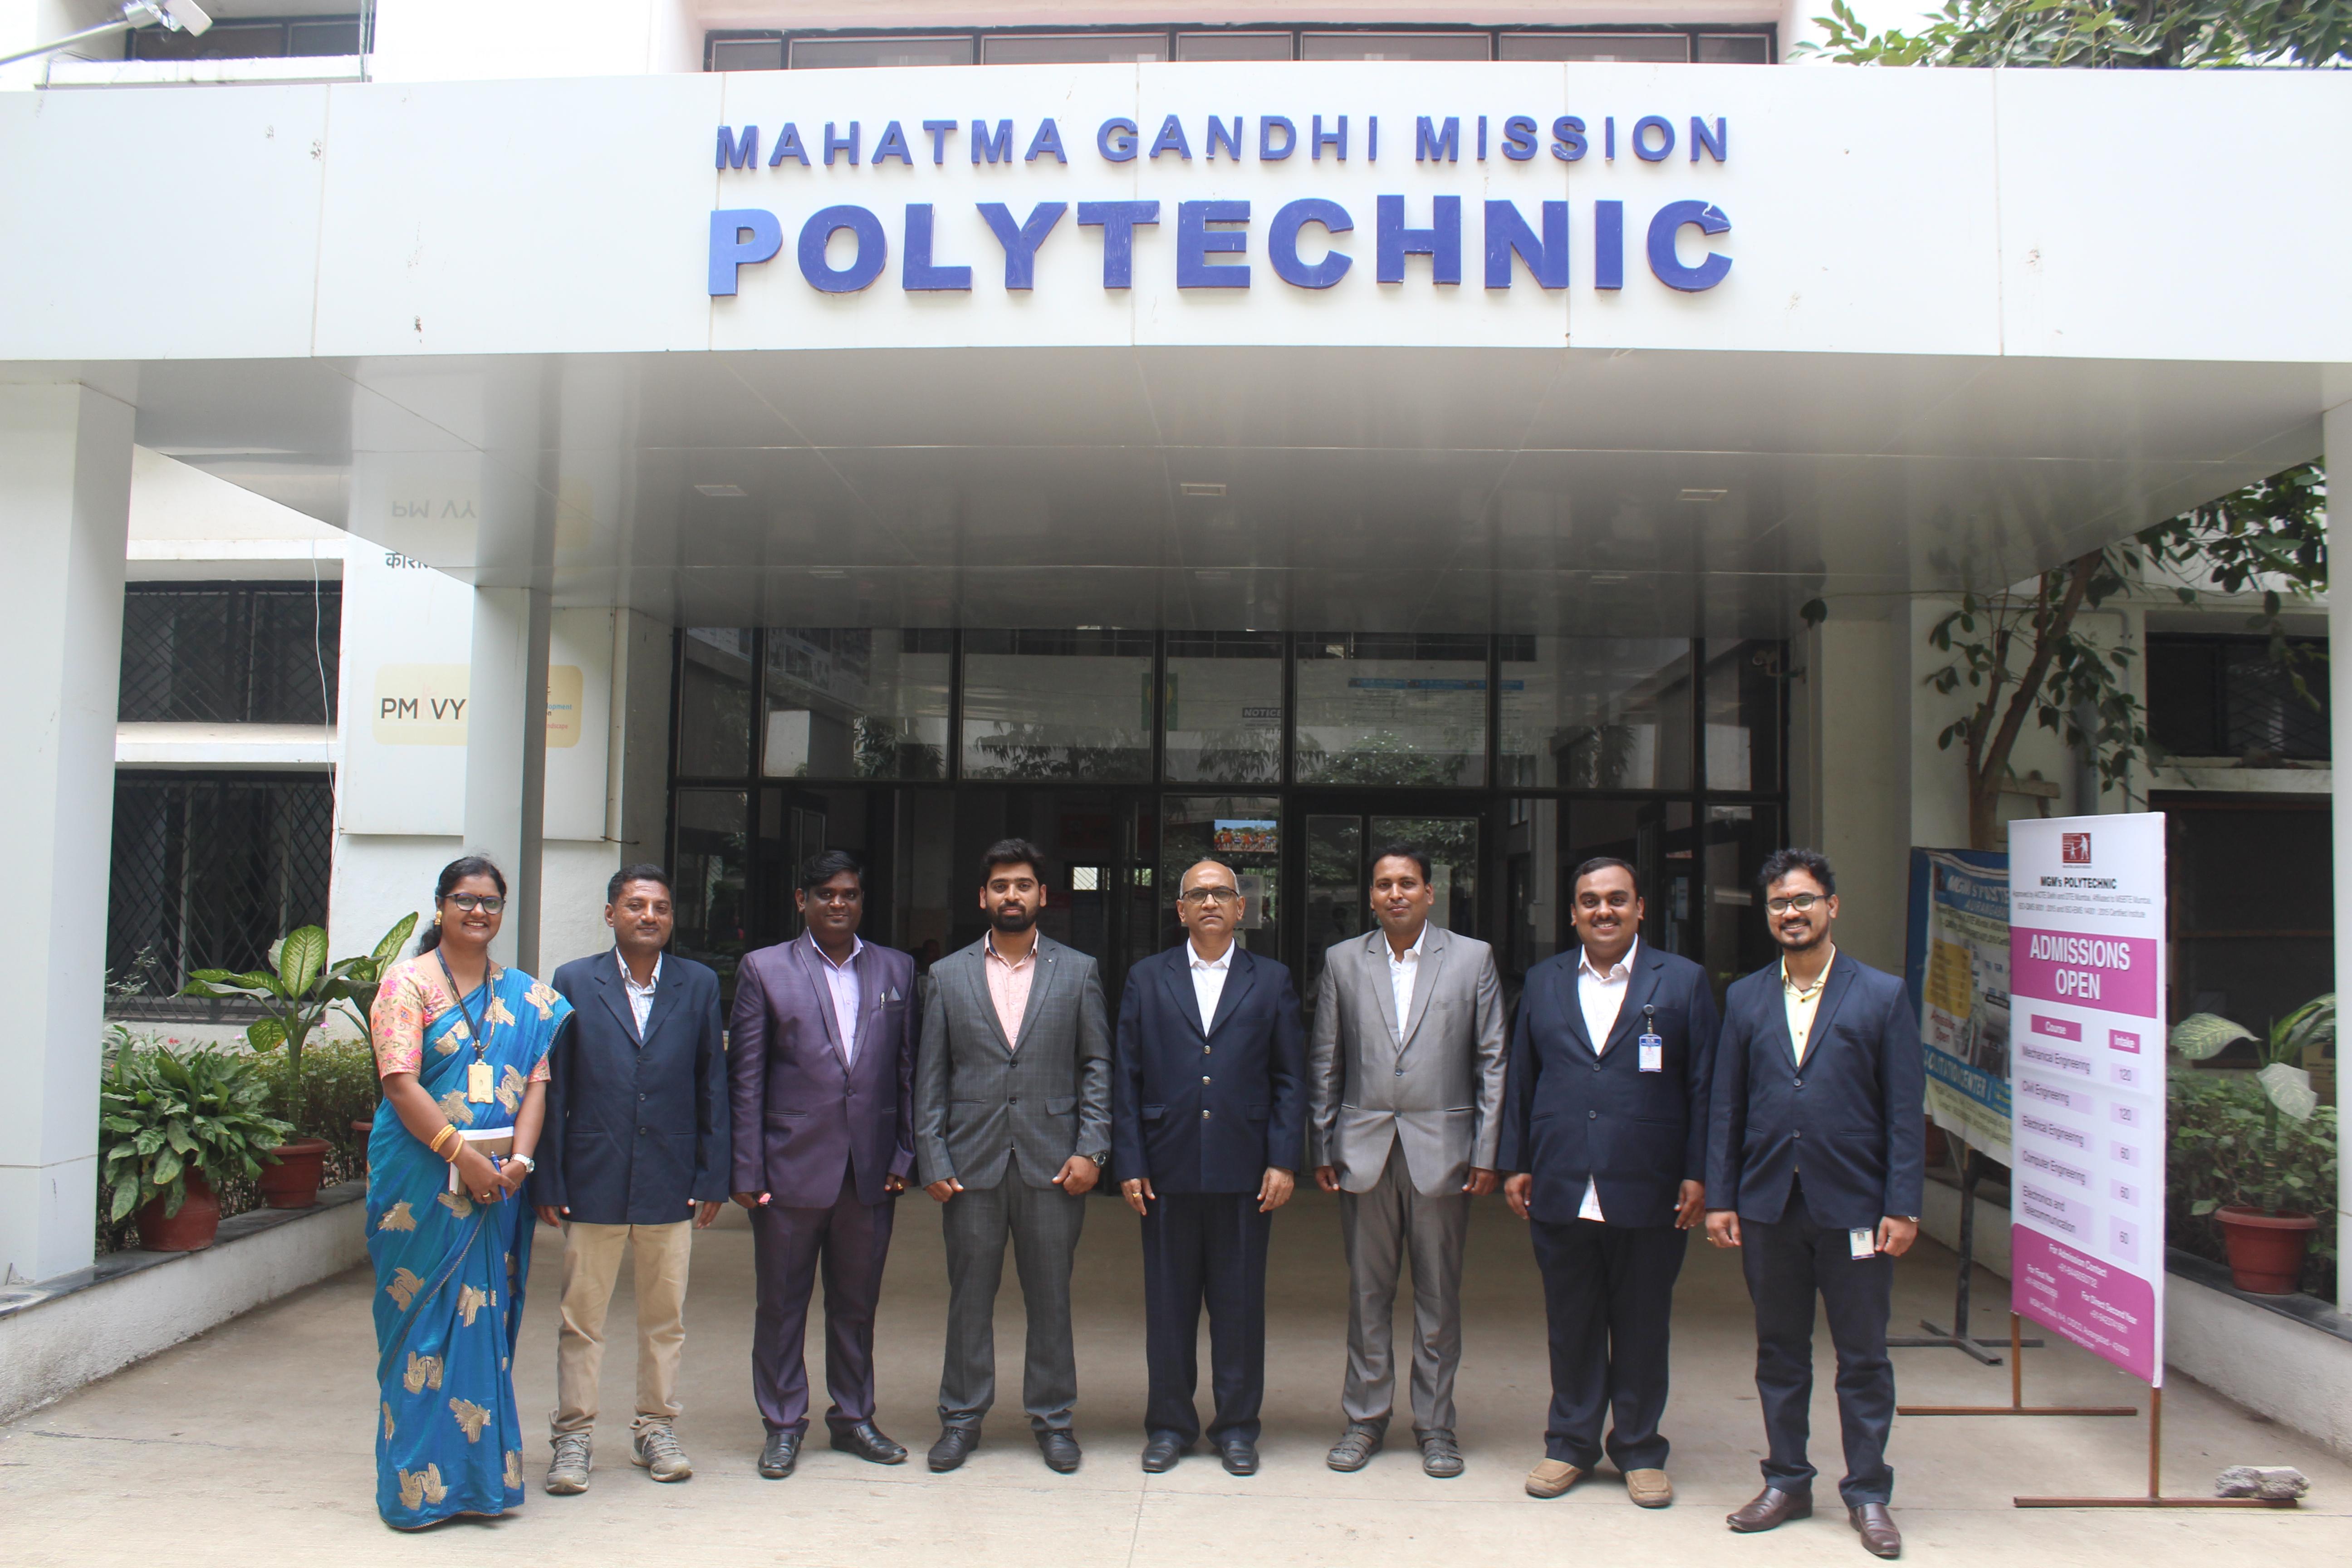 Mgm S Ploytechnic